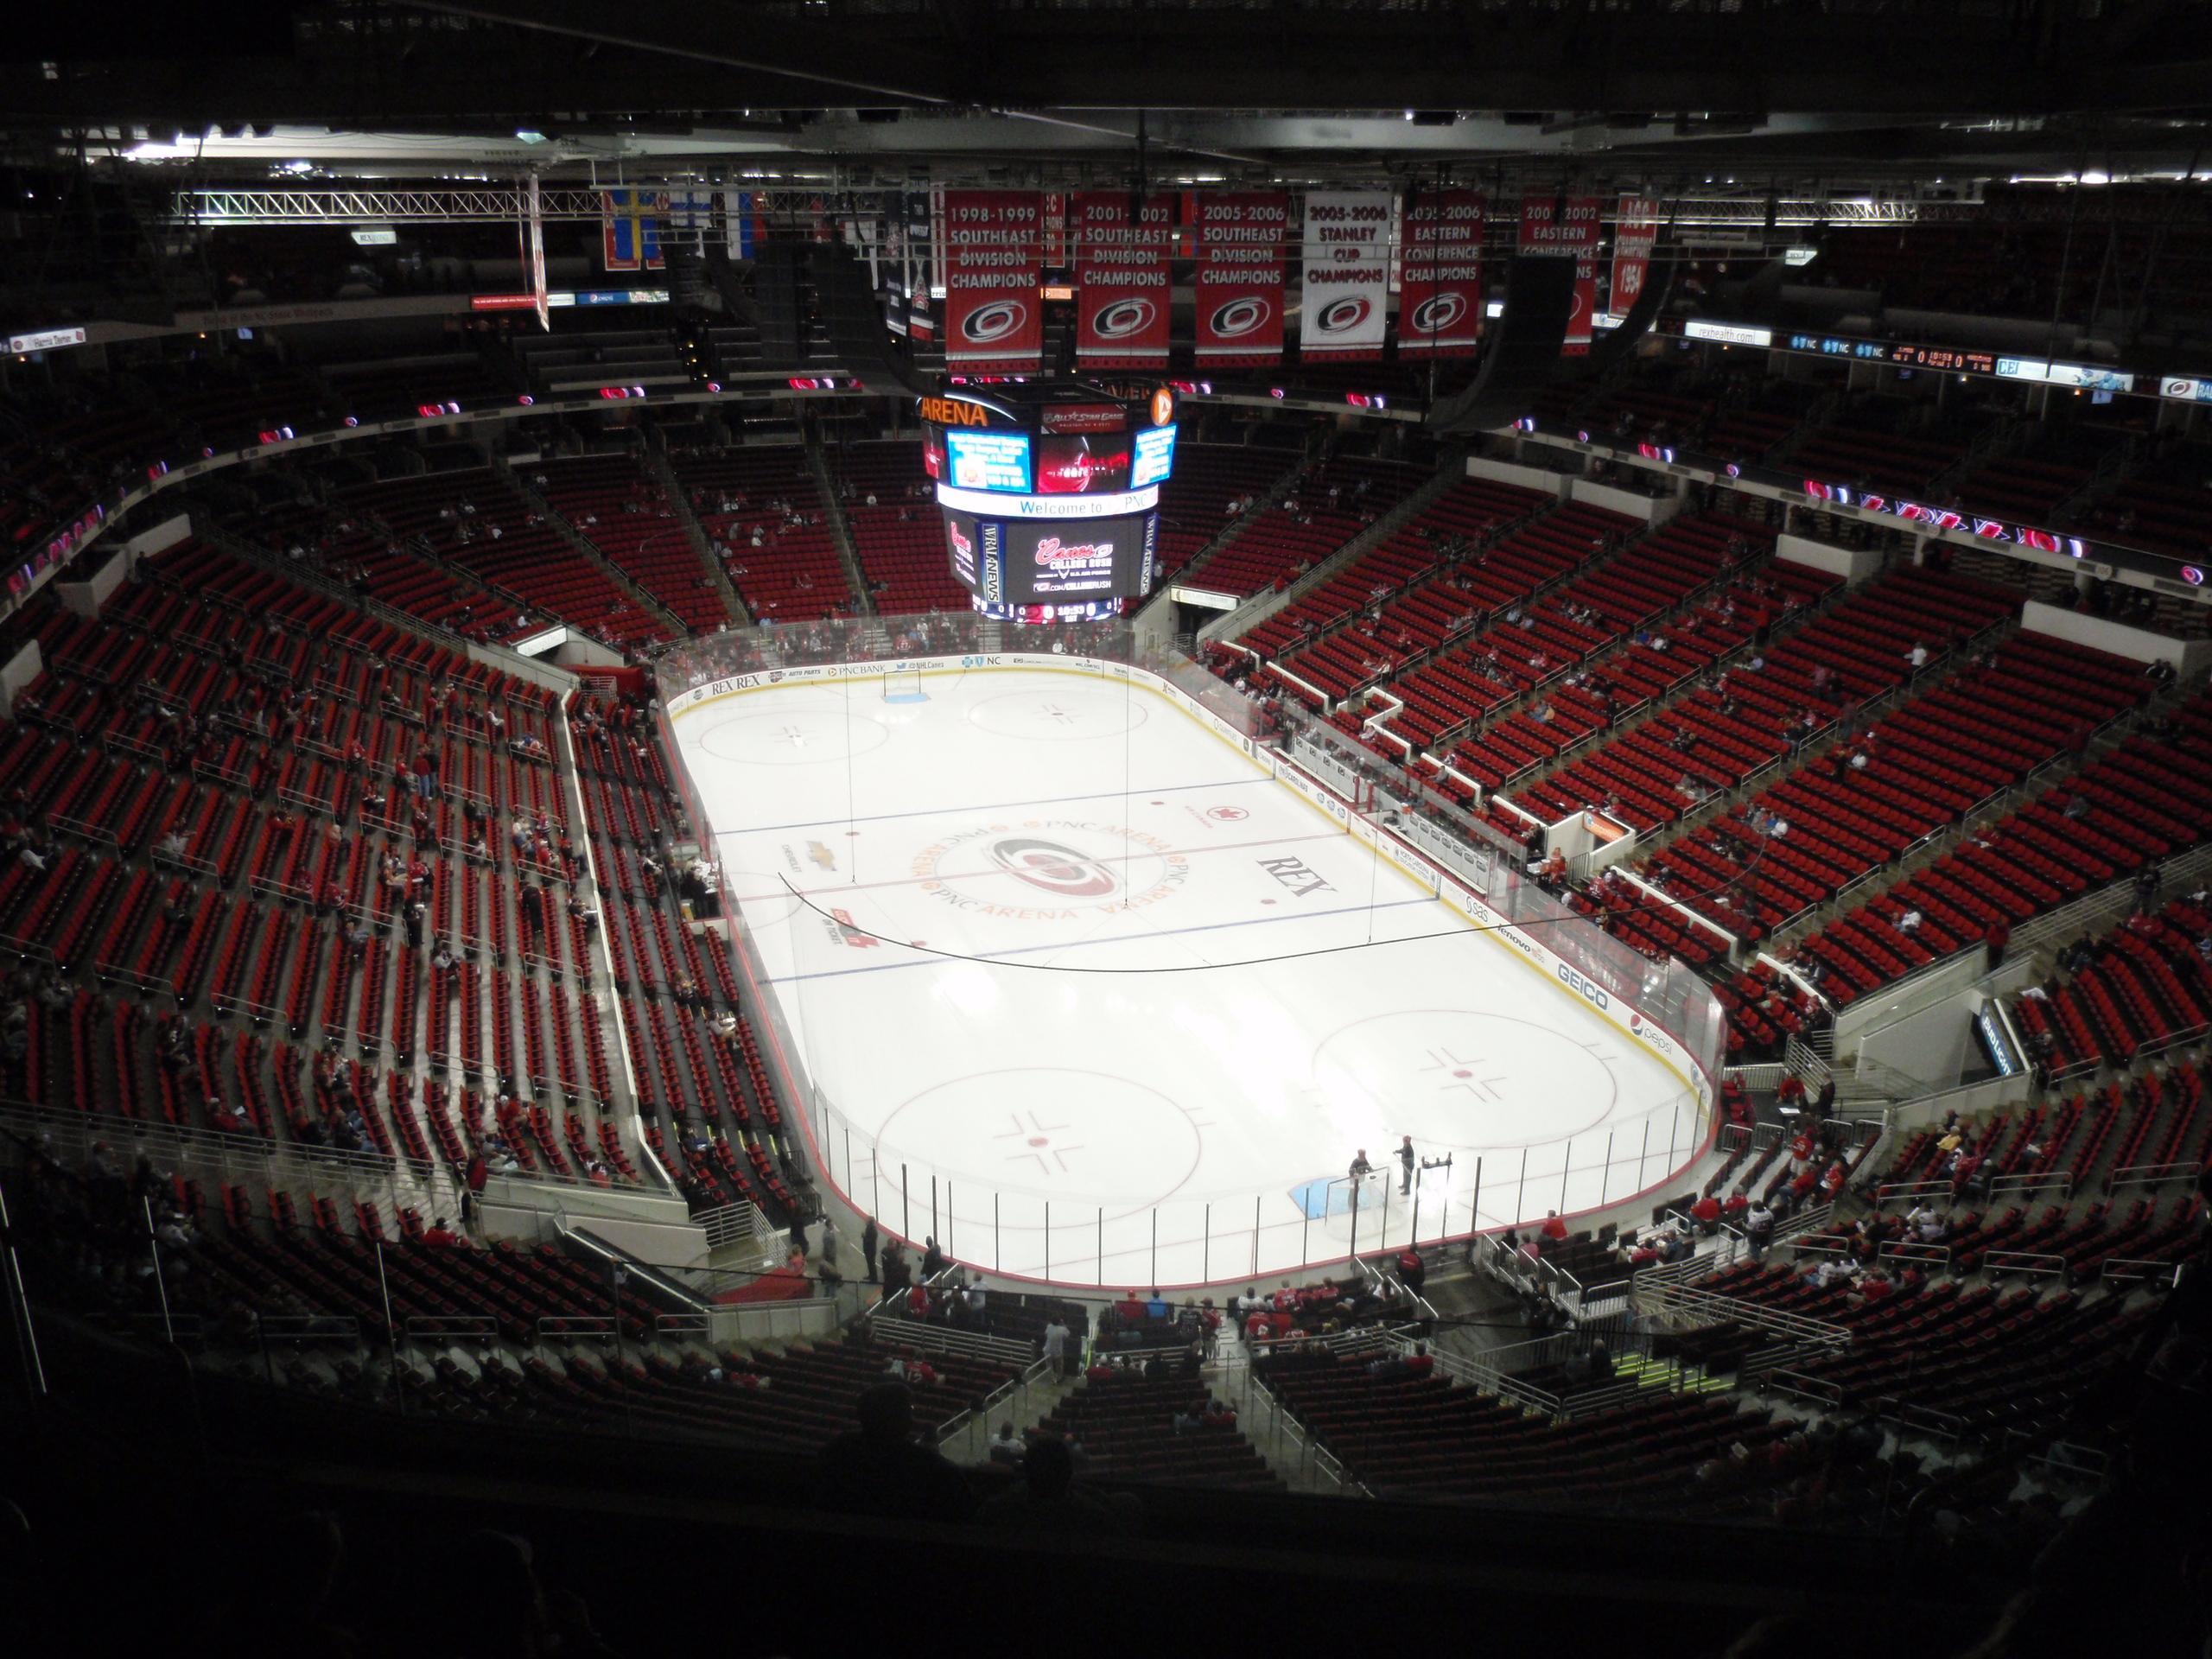 Pnc Arena Section 316 Carolina Hurricanes